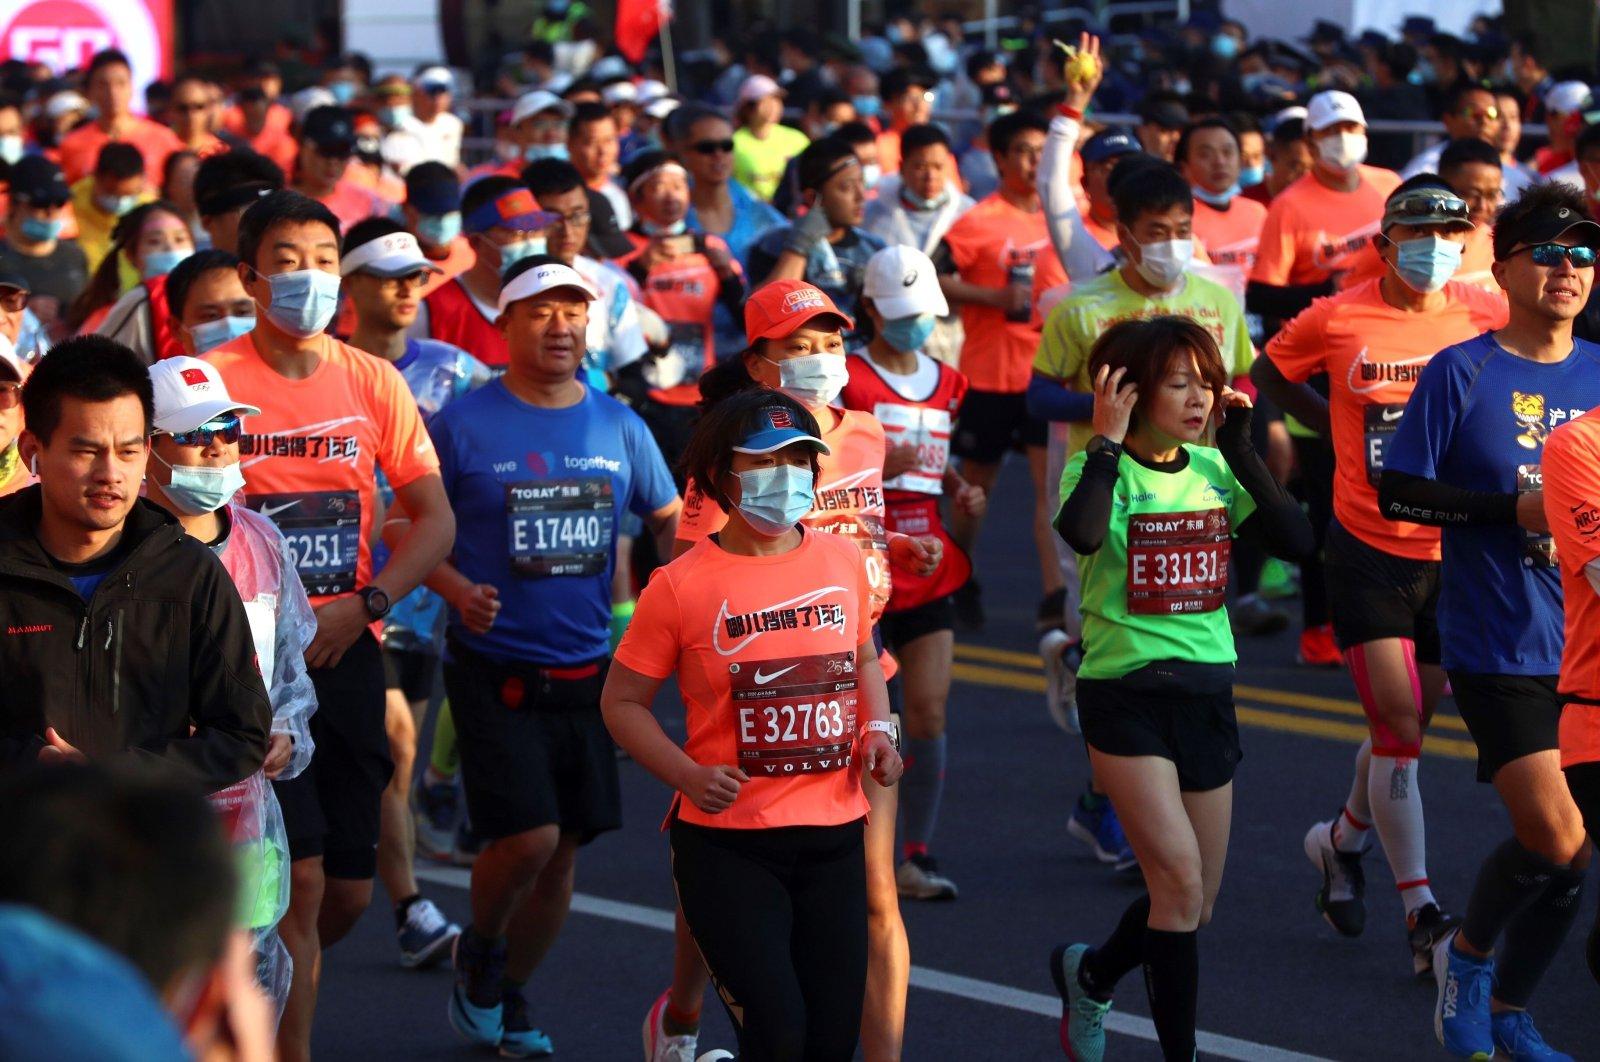 Runners take part in the Shanghai International Marathon in Shanghai, China, Nov. 29, 2020. (AFP Photo)